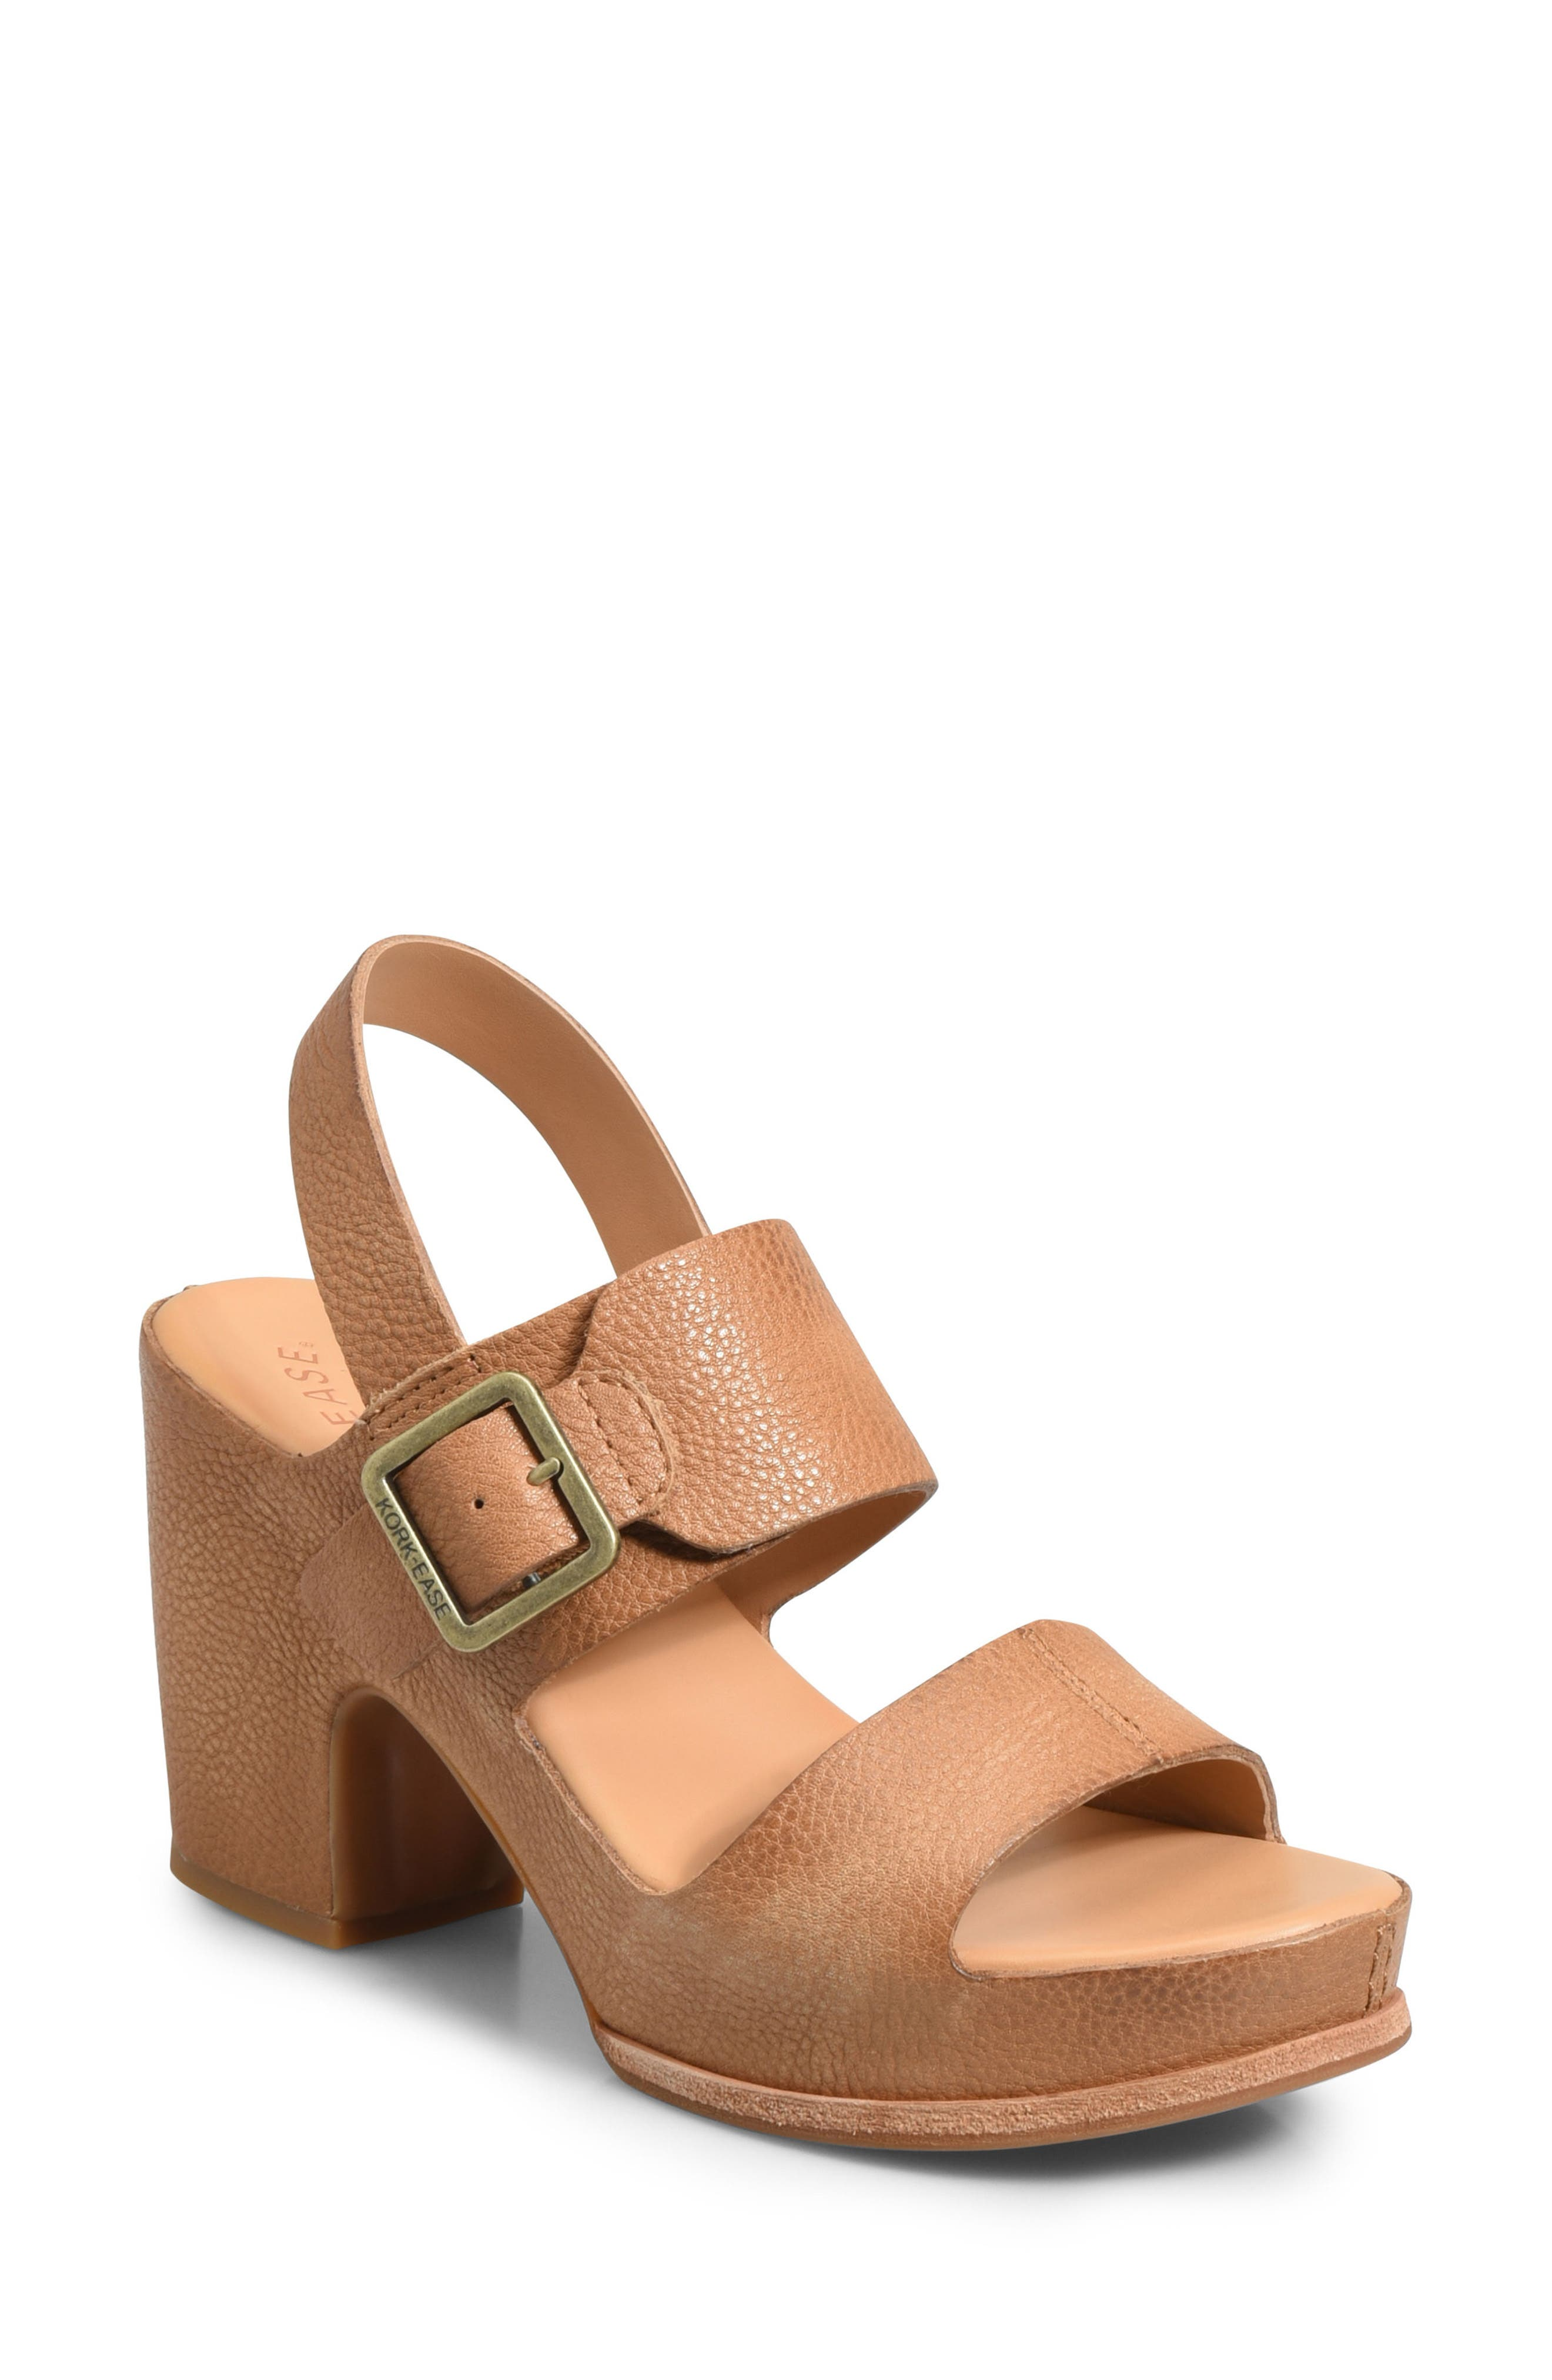 Main Image - Kork-Ease® San Carlos Platform Sandal (Women)